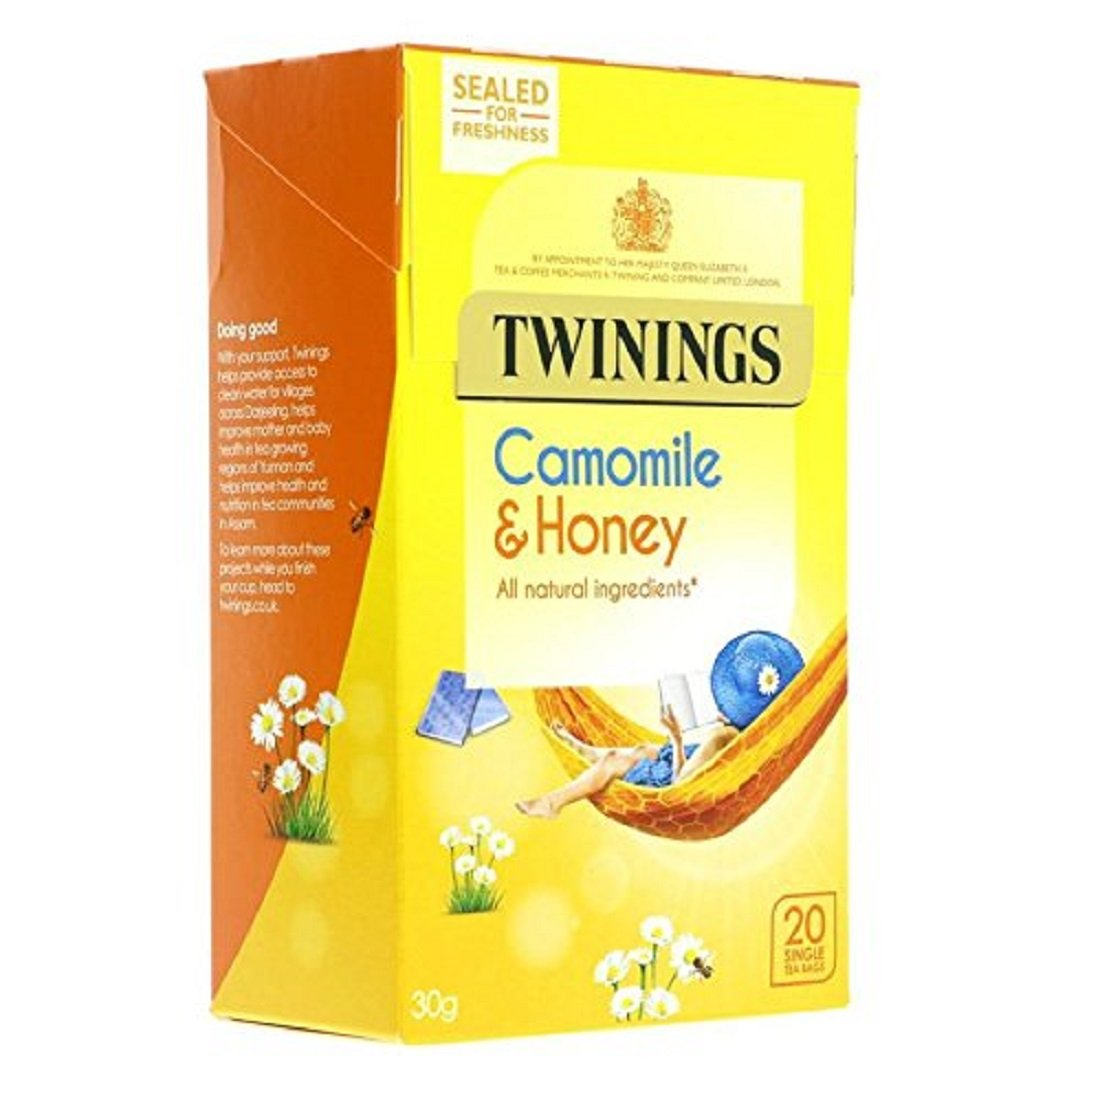 Twinings Camomile & Honey Tea Tea Bags